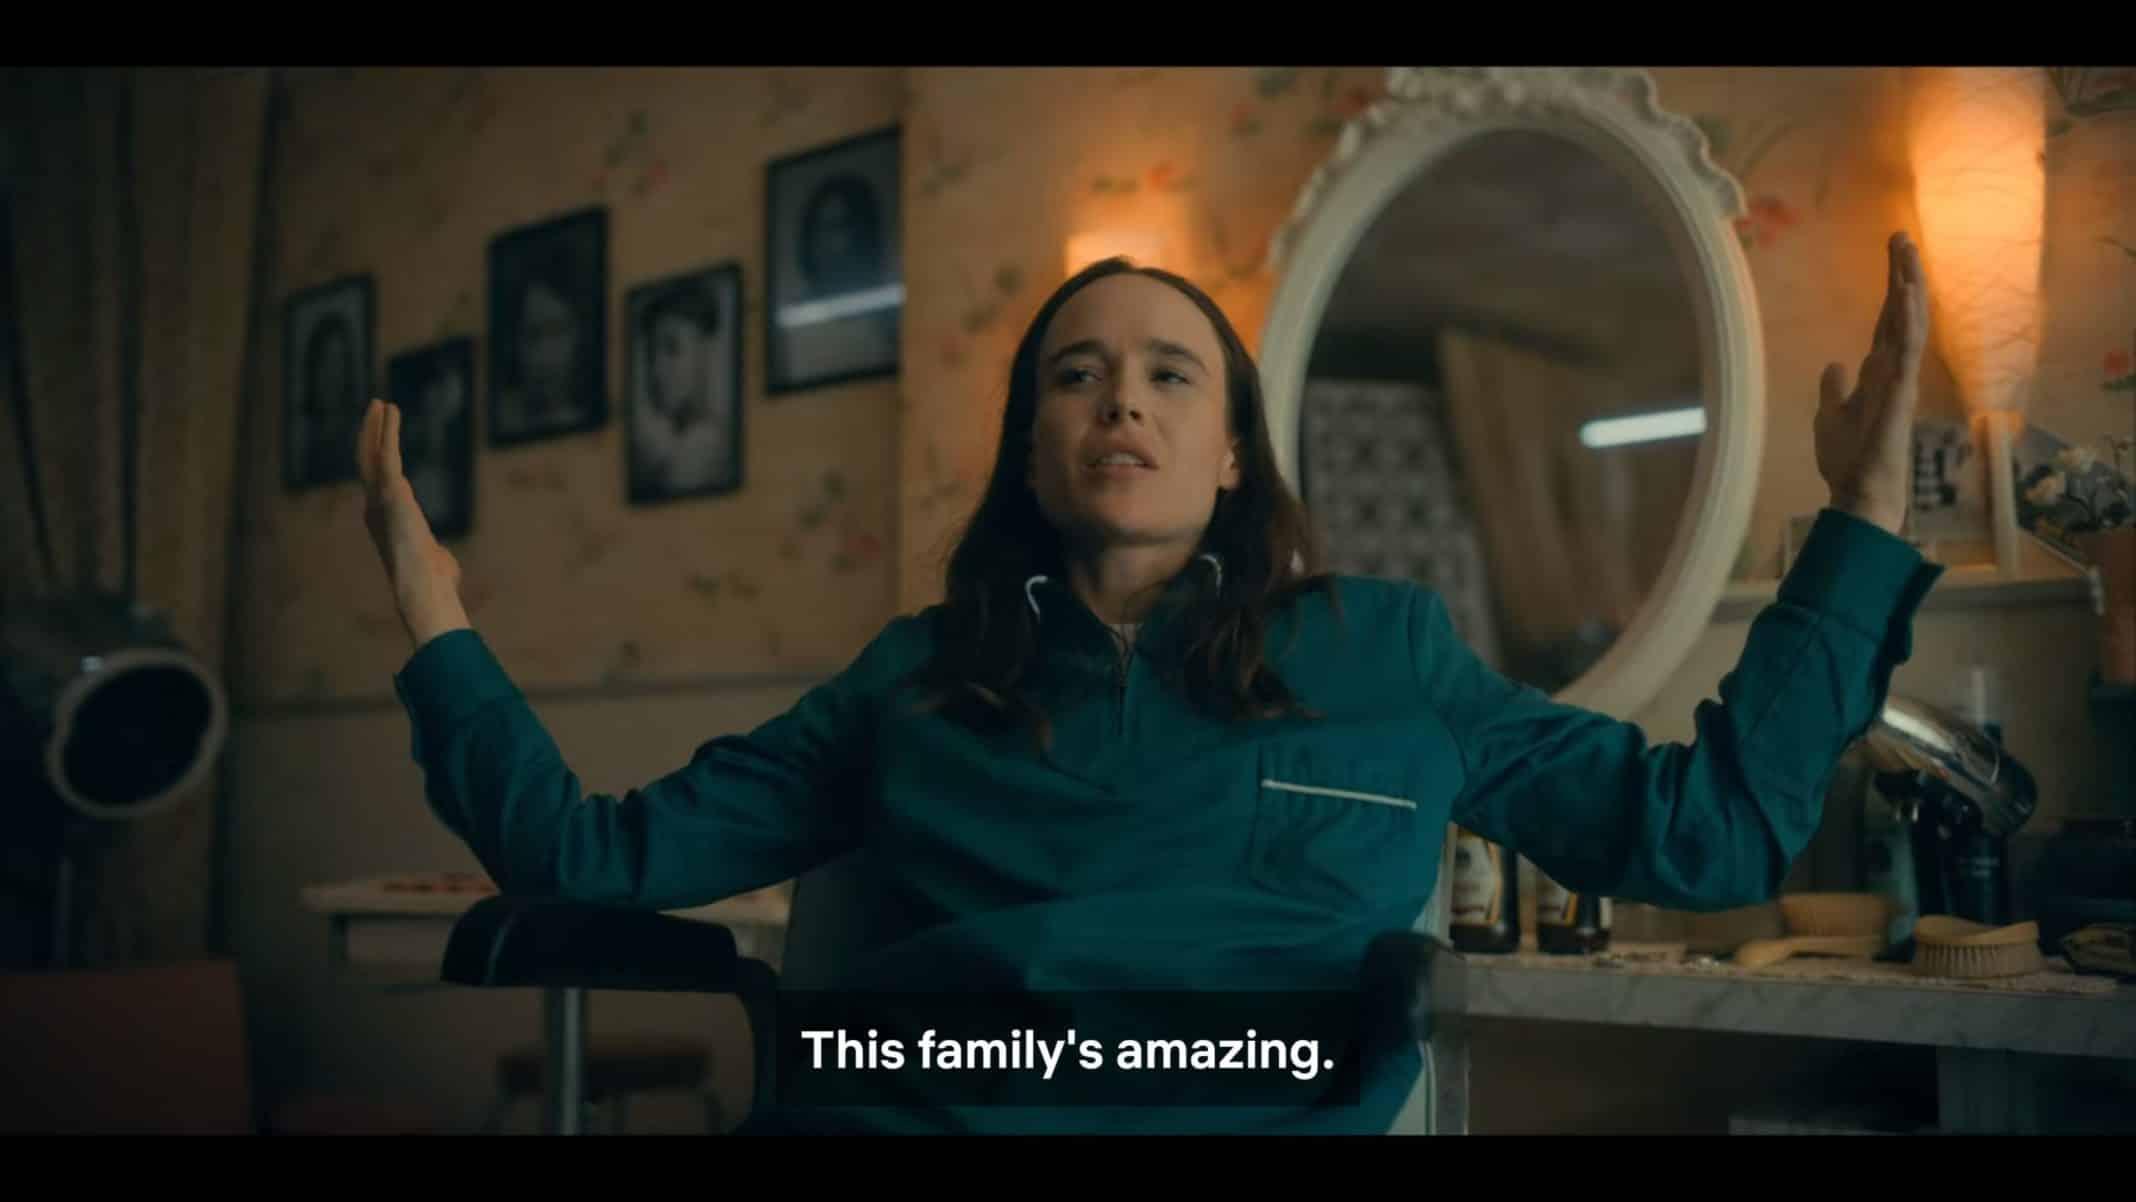 Vanya noting her family is amazing.